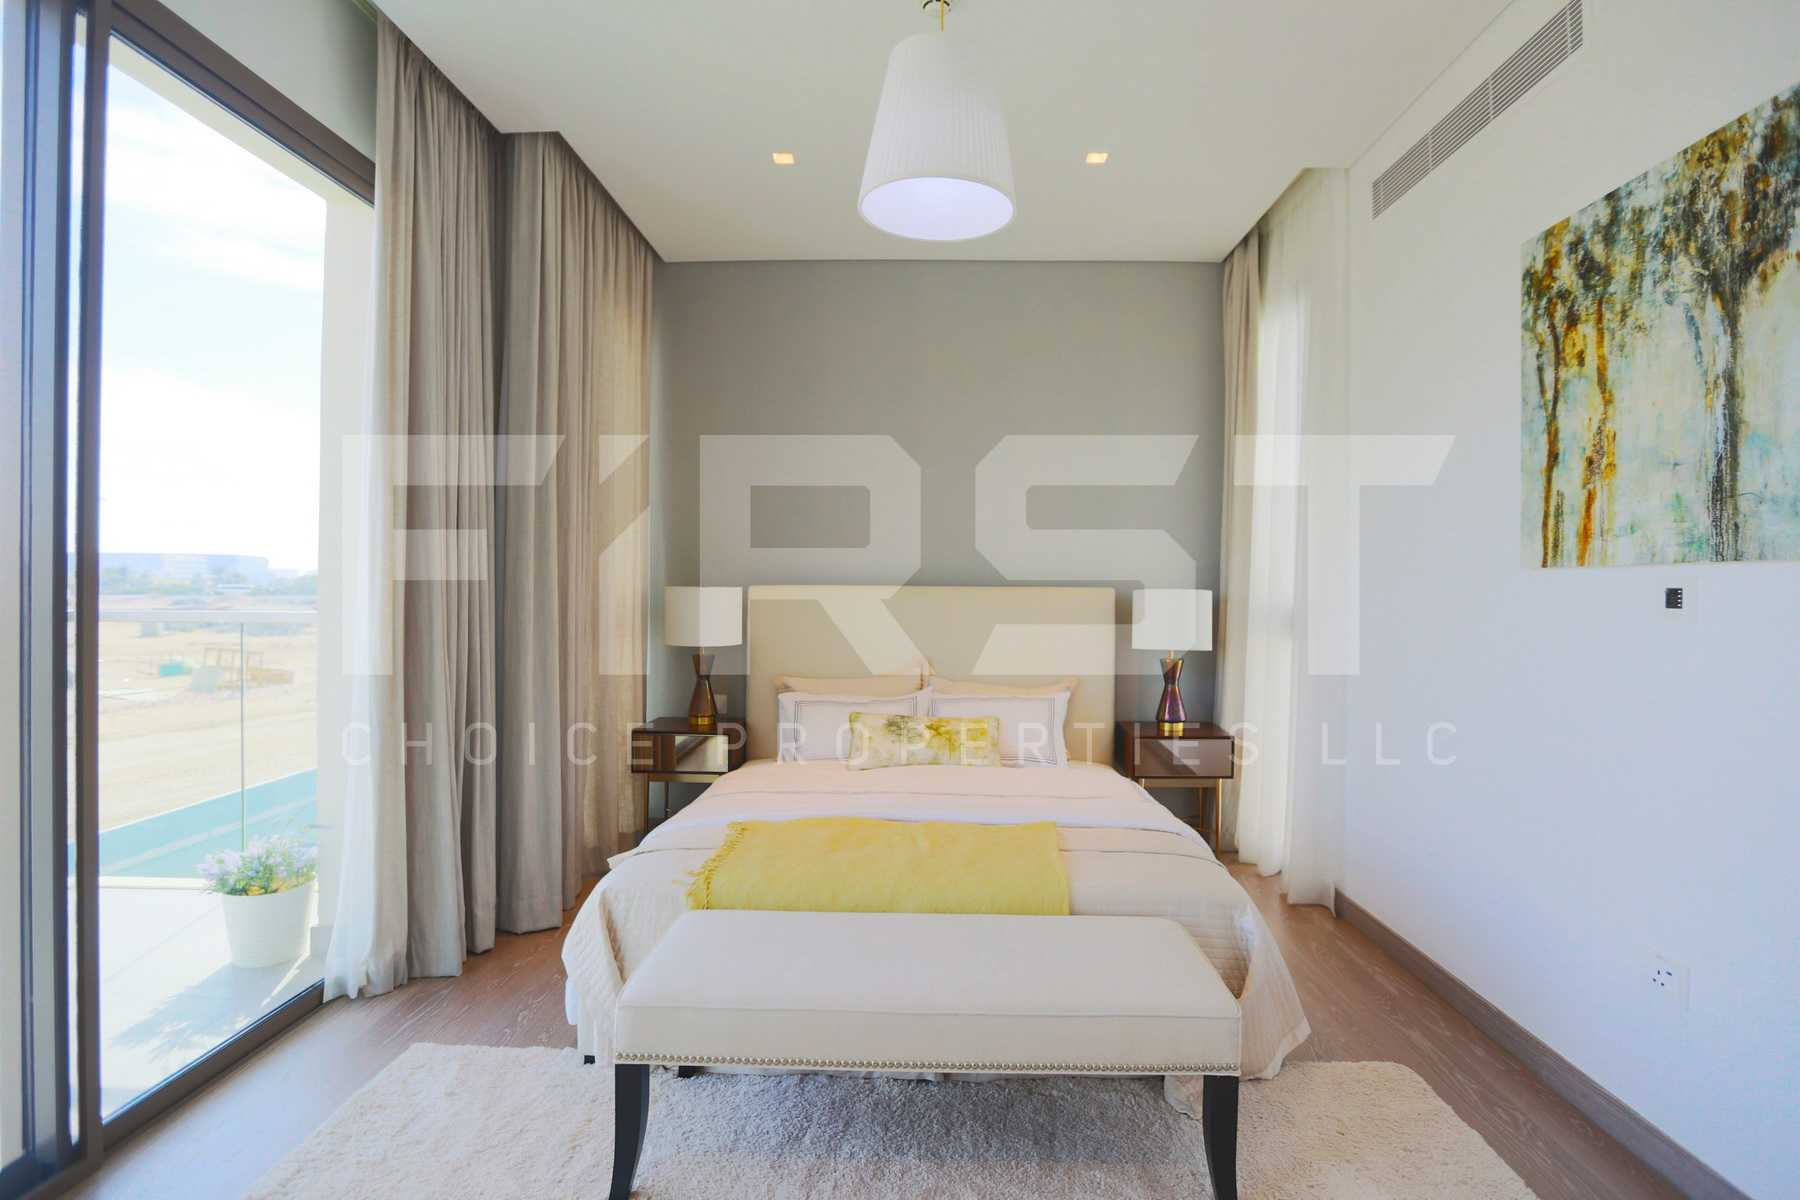 Internal Photo of 4 Bedroom Villa Type 4F in Yas Acres Yas Island Abu Dhabi UAE (13).jpg